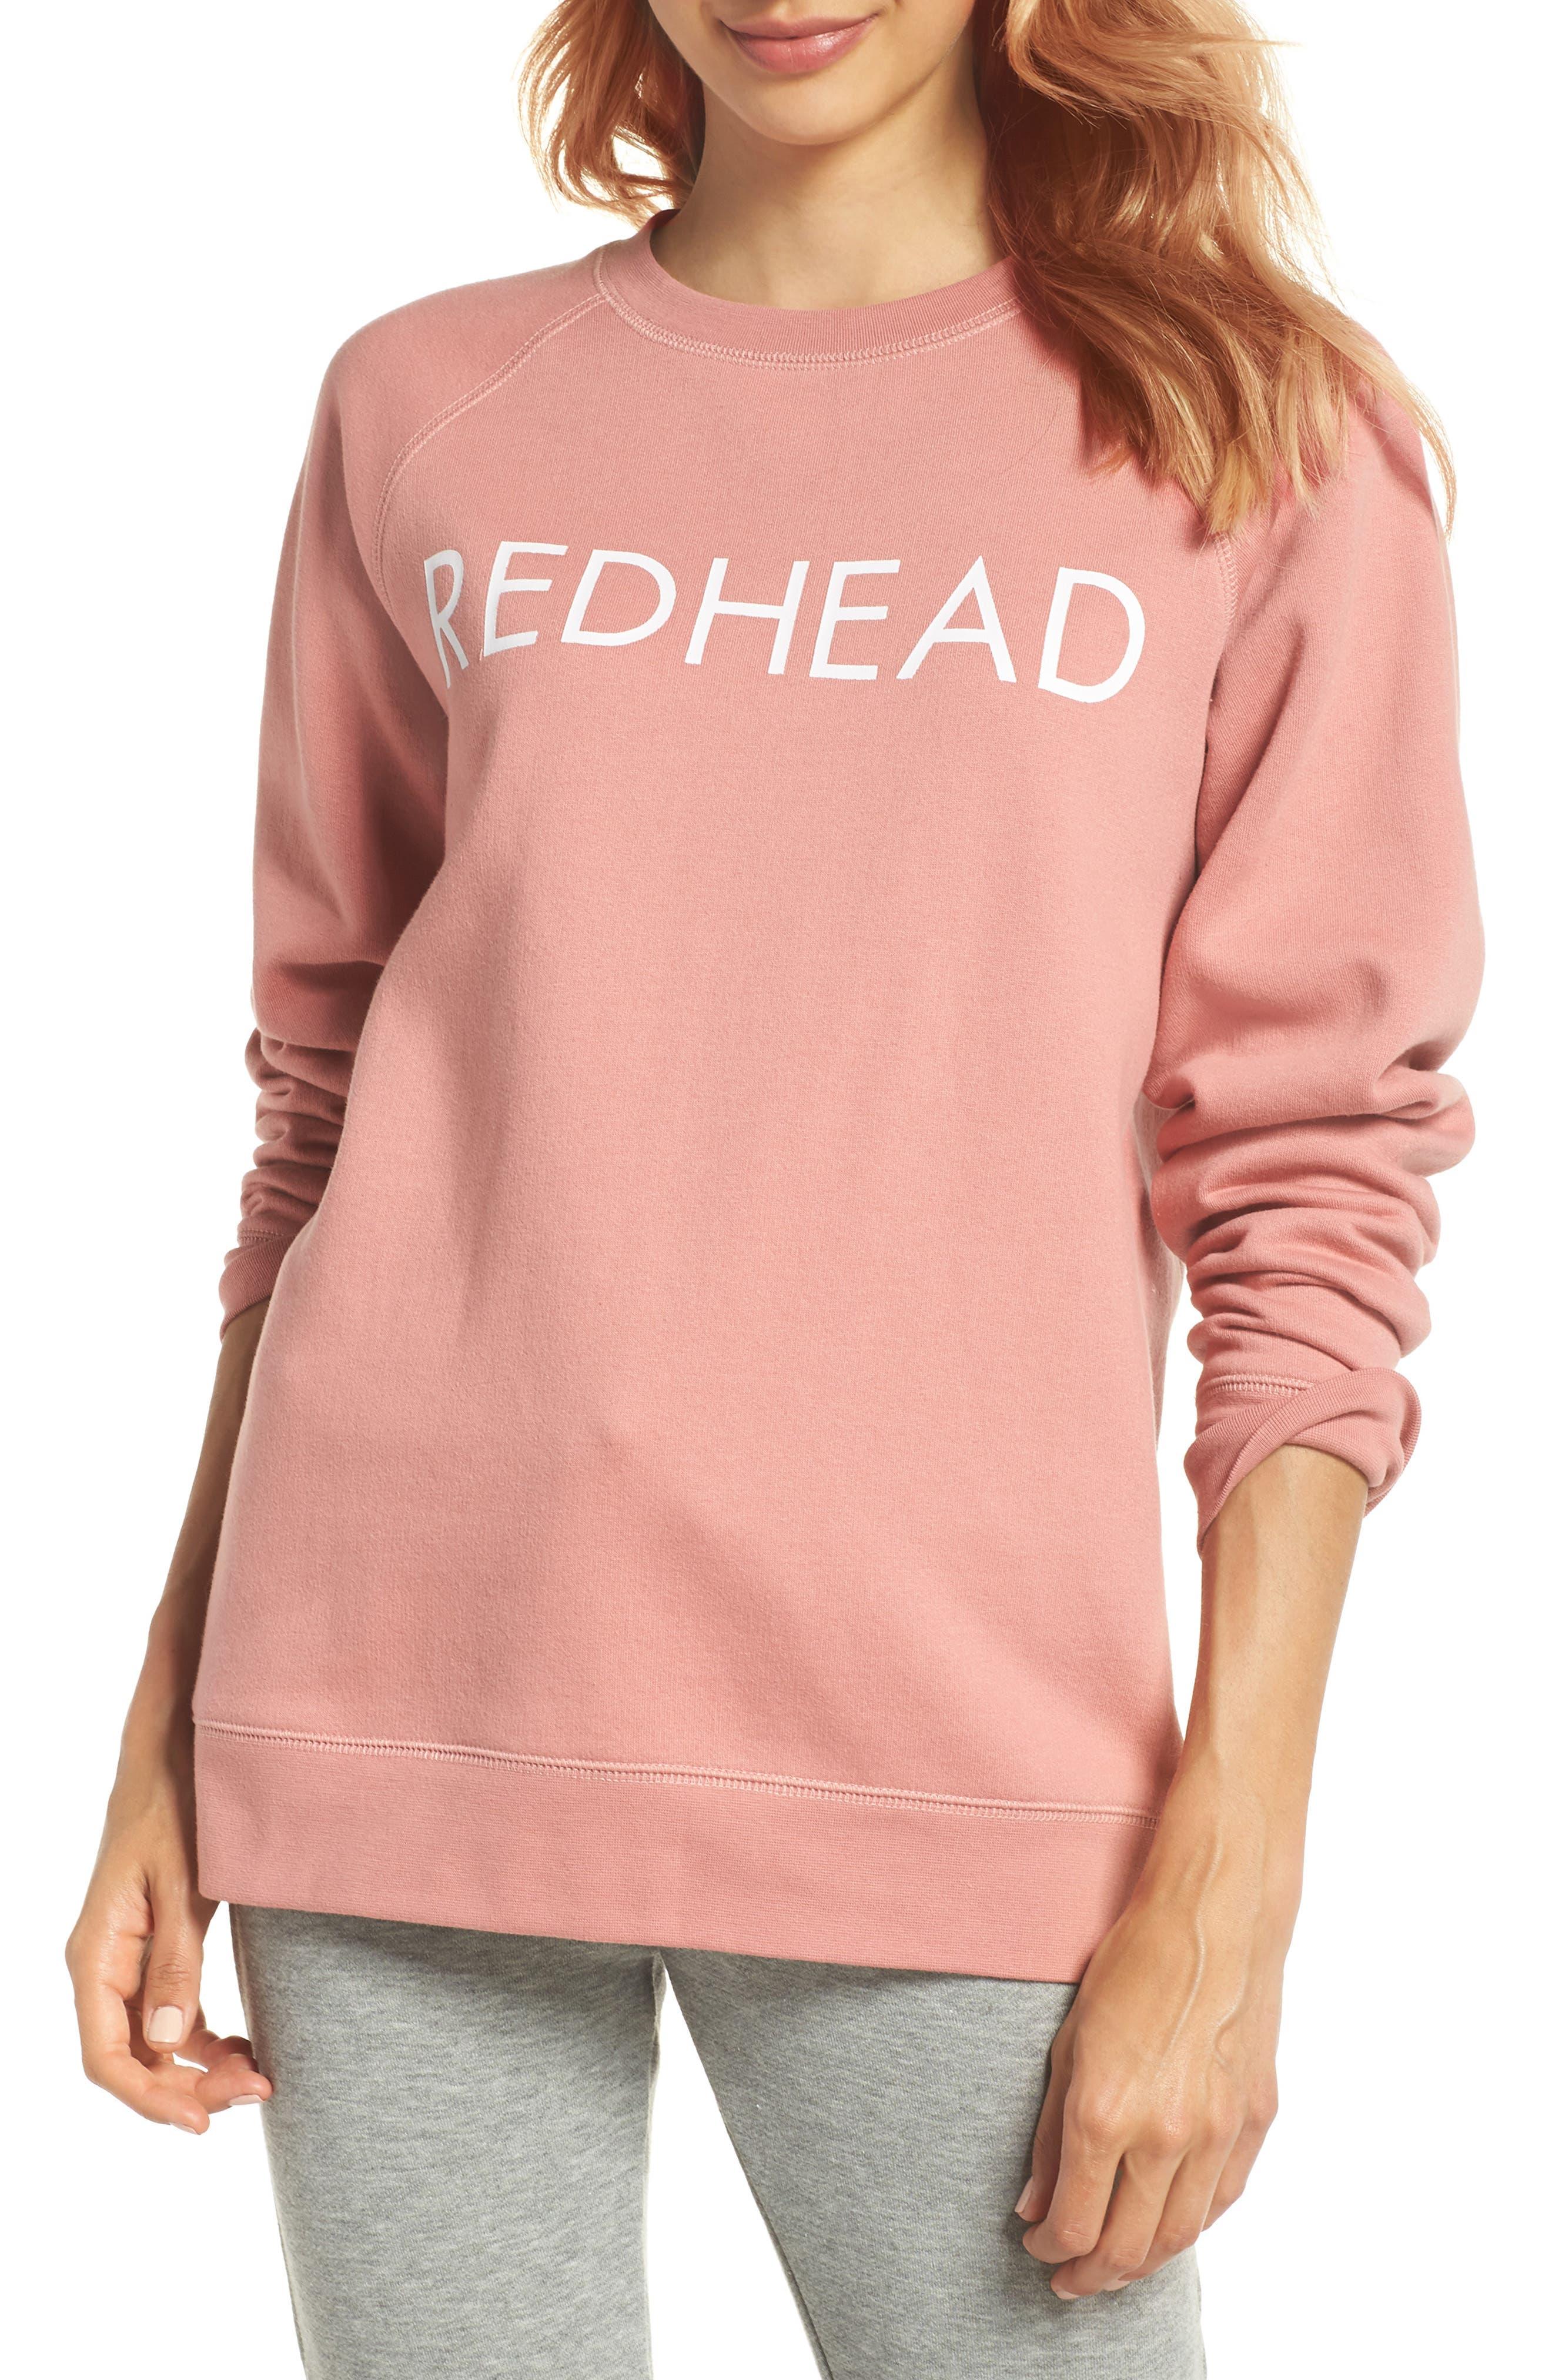 Redhead Crewneck Sweatshirt,                             Main thumbnail 1, color,                             Dusty Rose